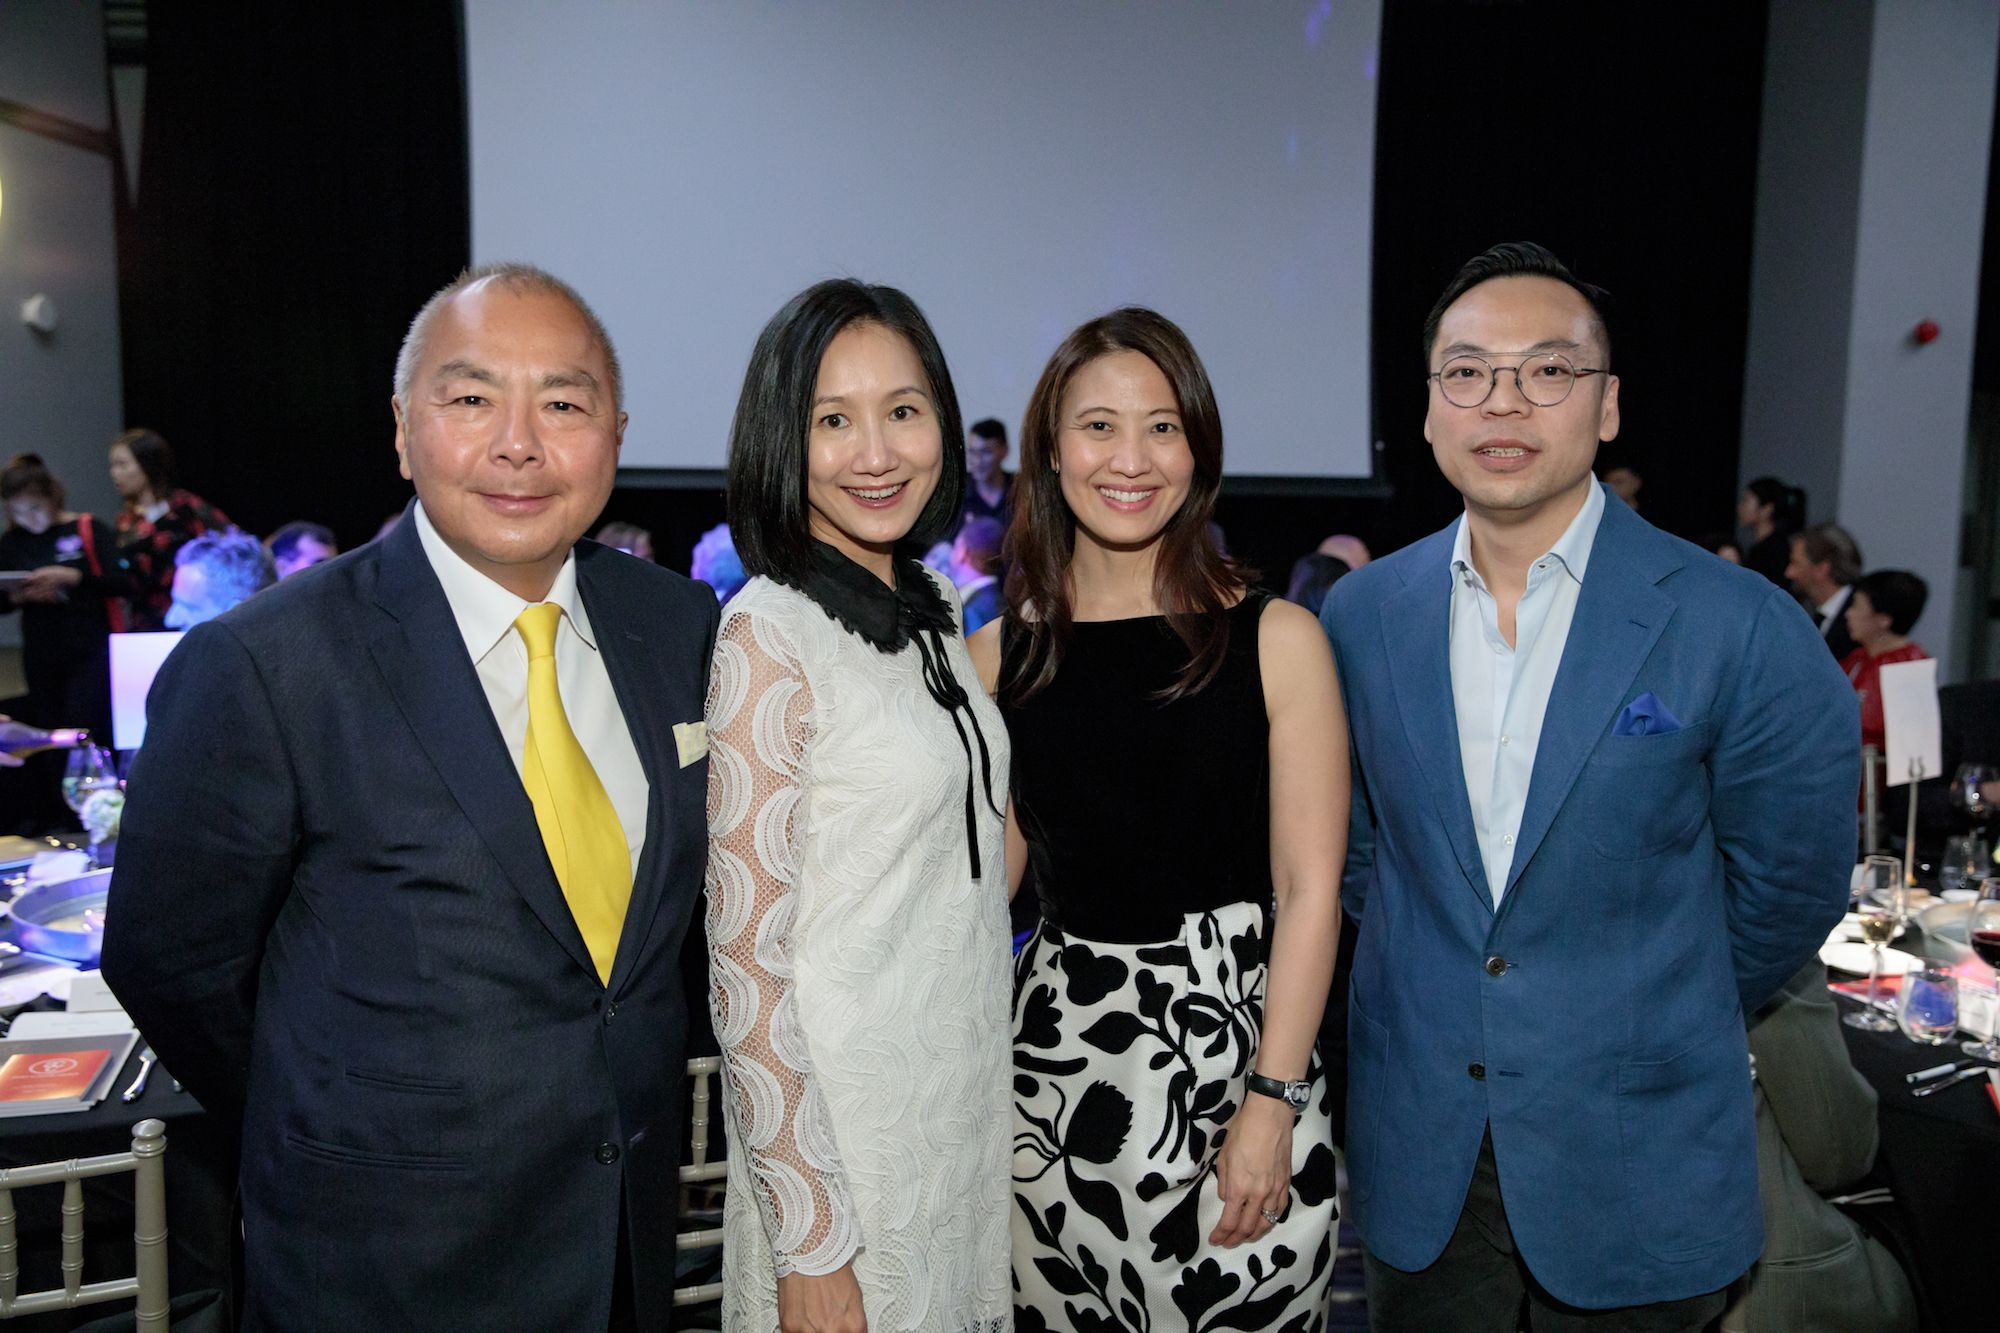 Joseph Fung, Yama Gaw, Daphne King-Yao, Alan Lo